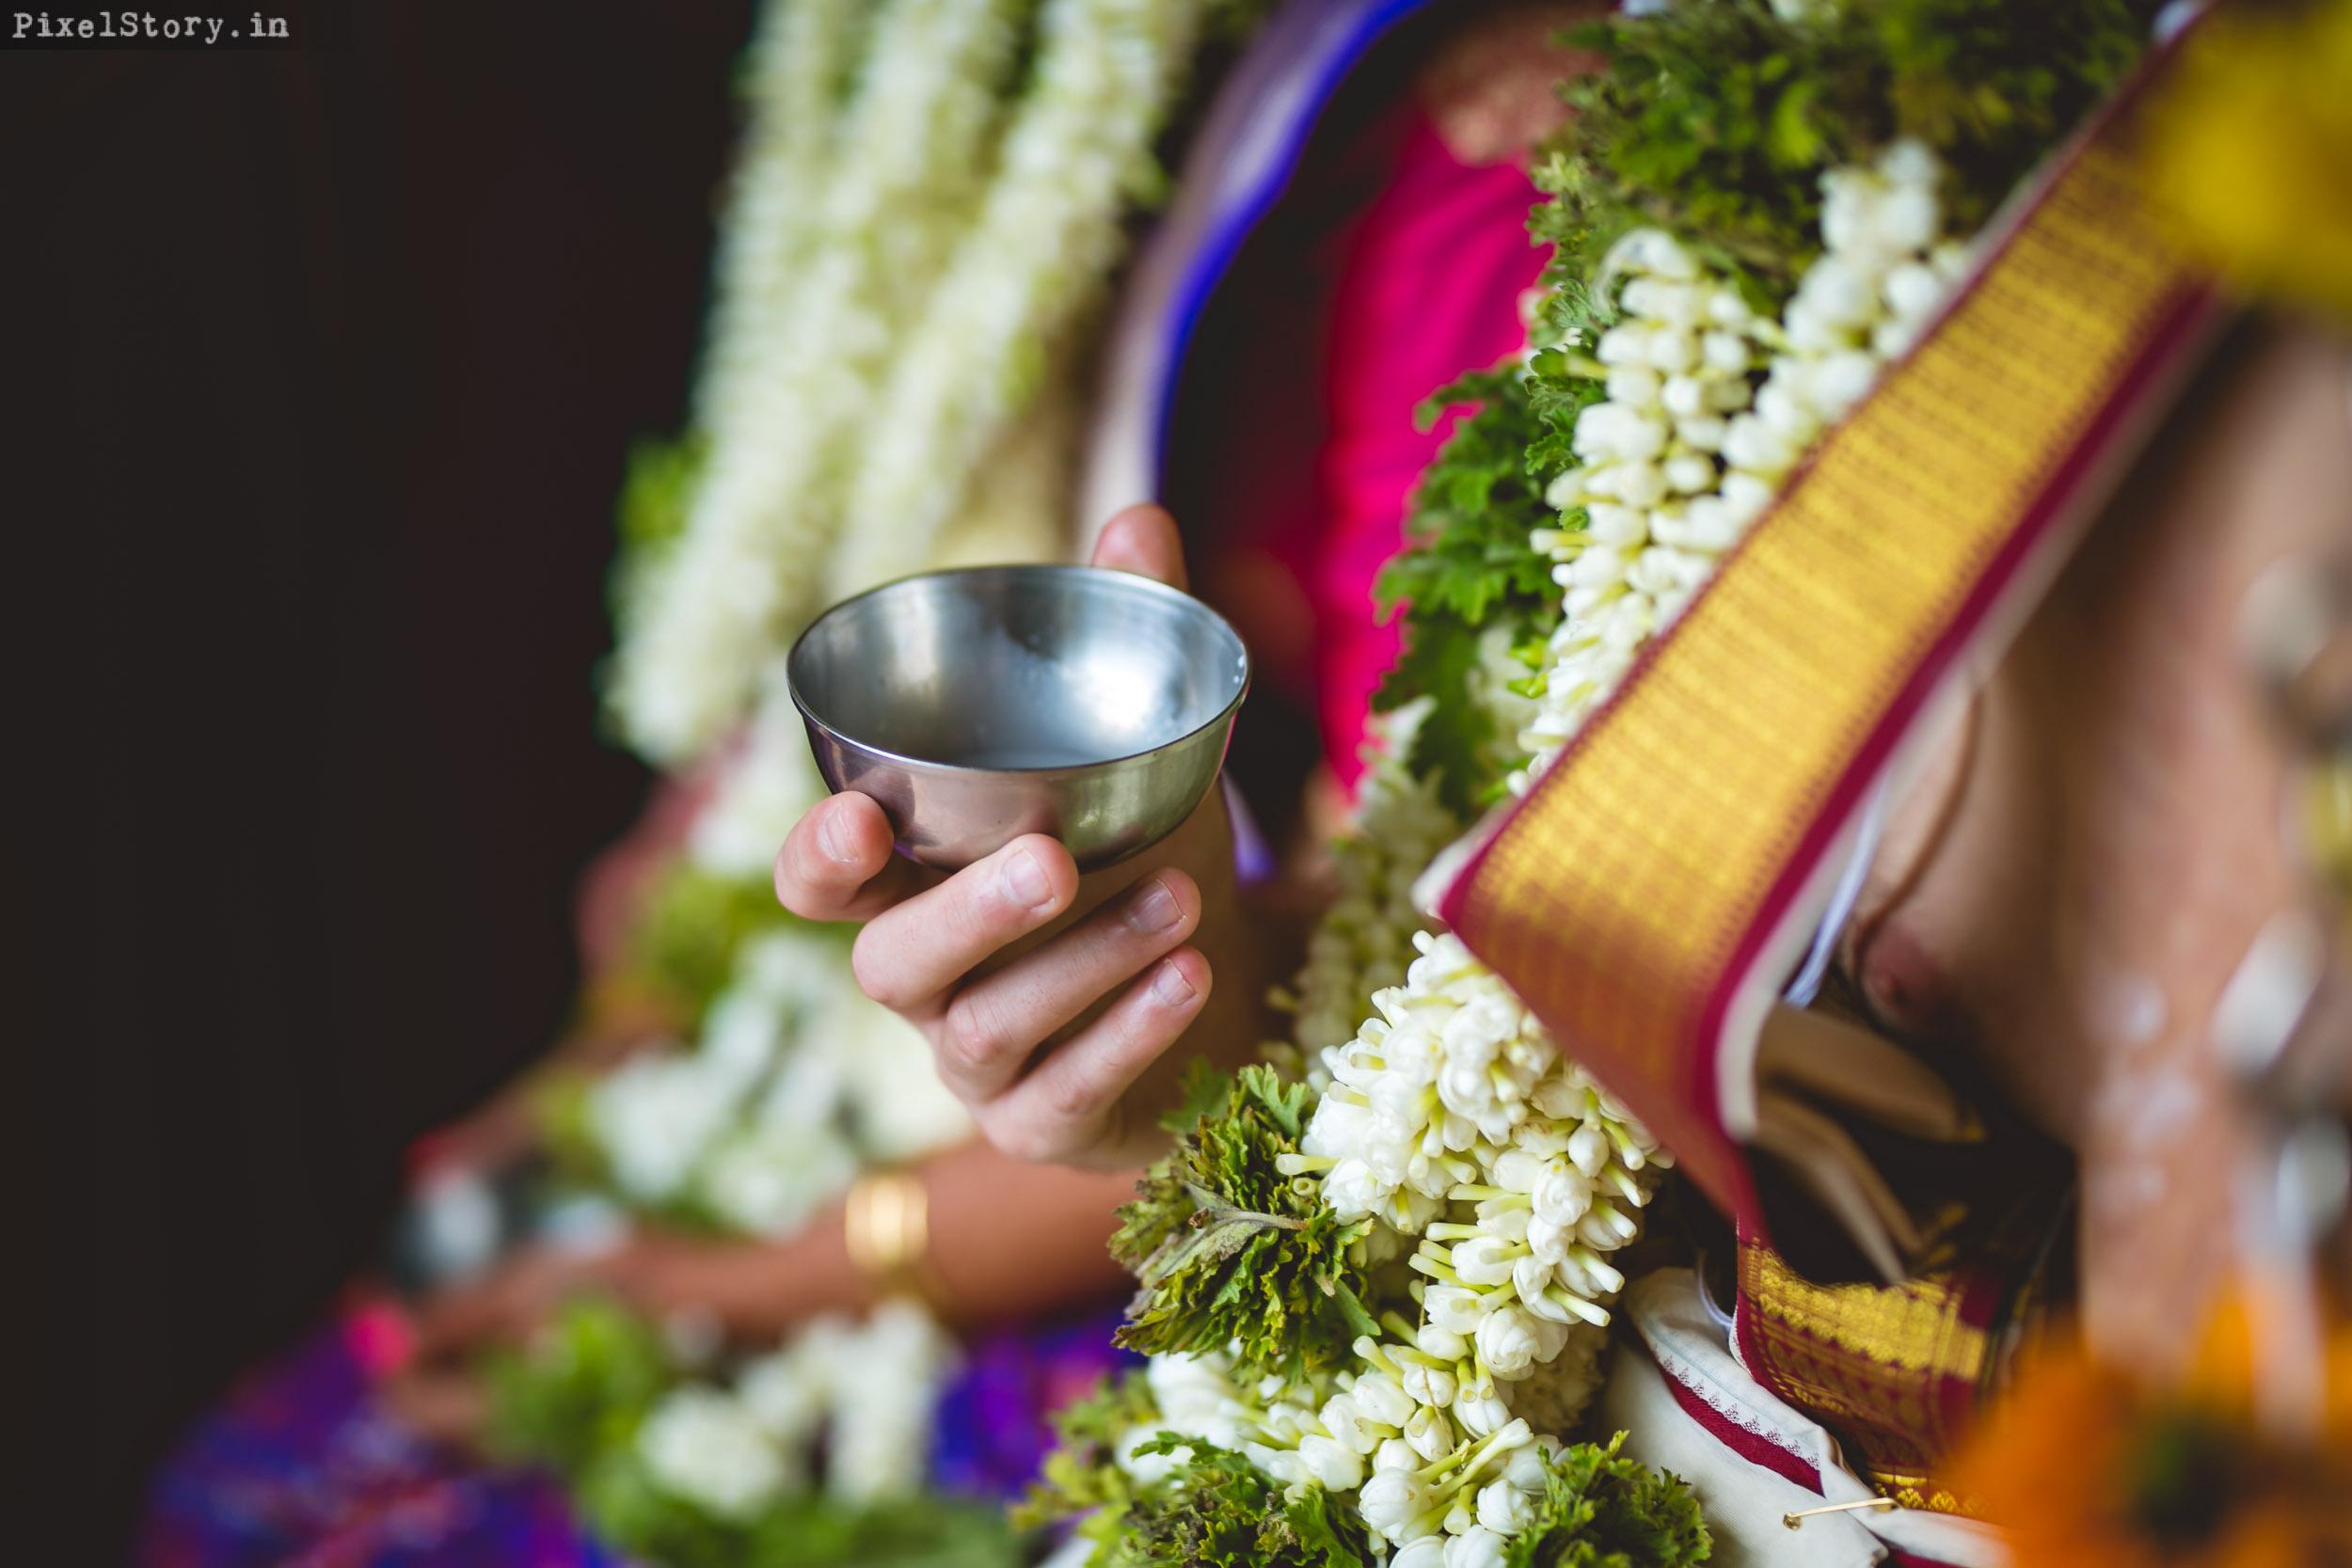 PixelStory-Jungle-Wedding-Photographer-Masinagudi-Indo-French036.jpg